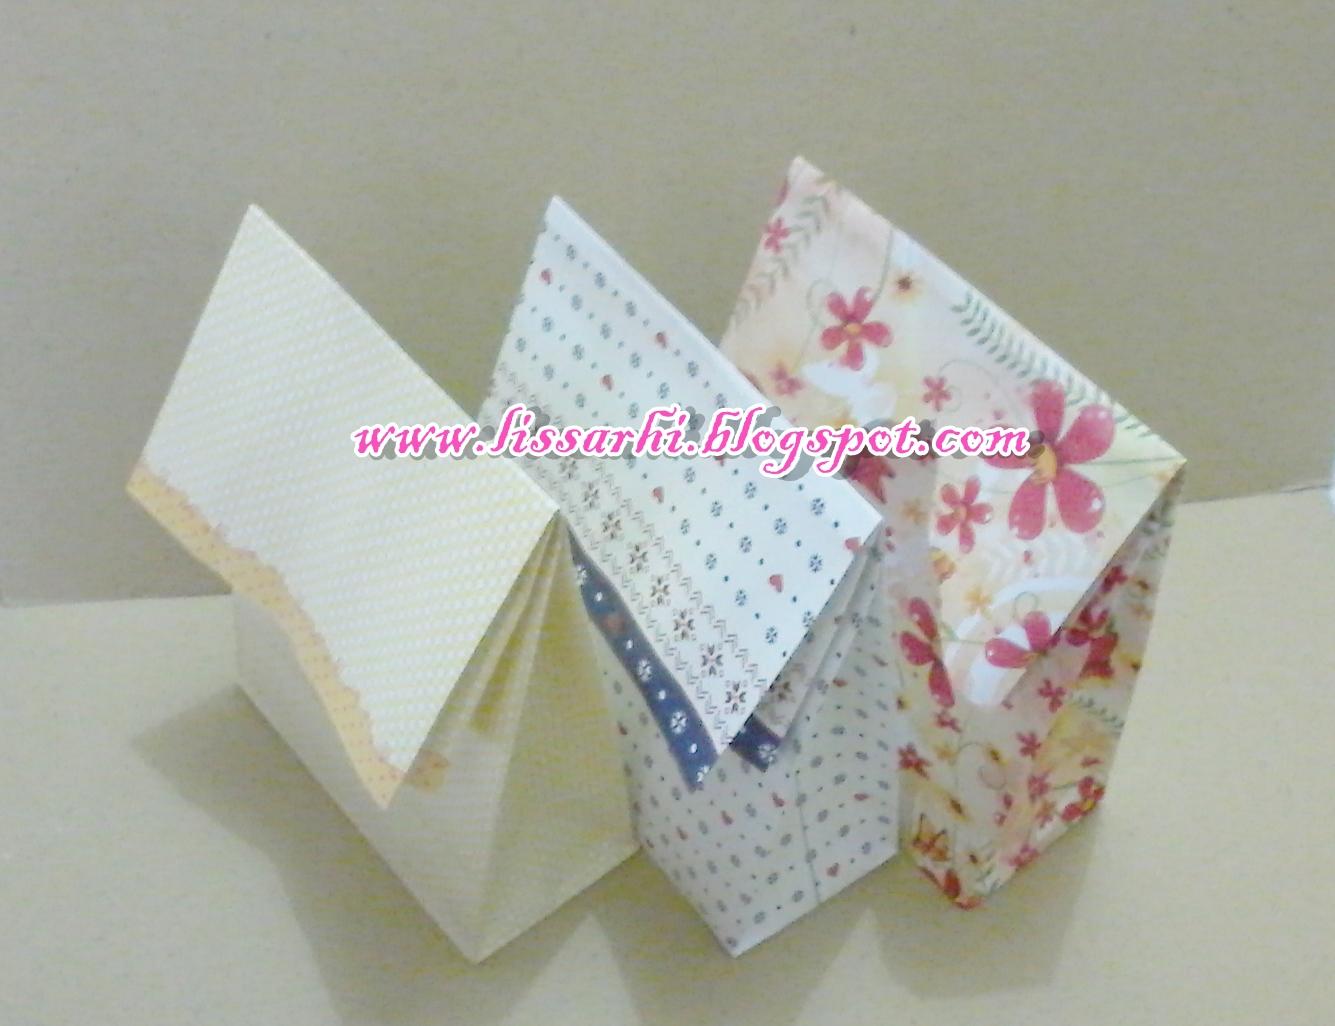 Cara Membungkus Kado Bentuk Tas (Membuat Paper Bag) - Parcel Pernikahan 7e3e6b753f